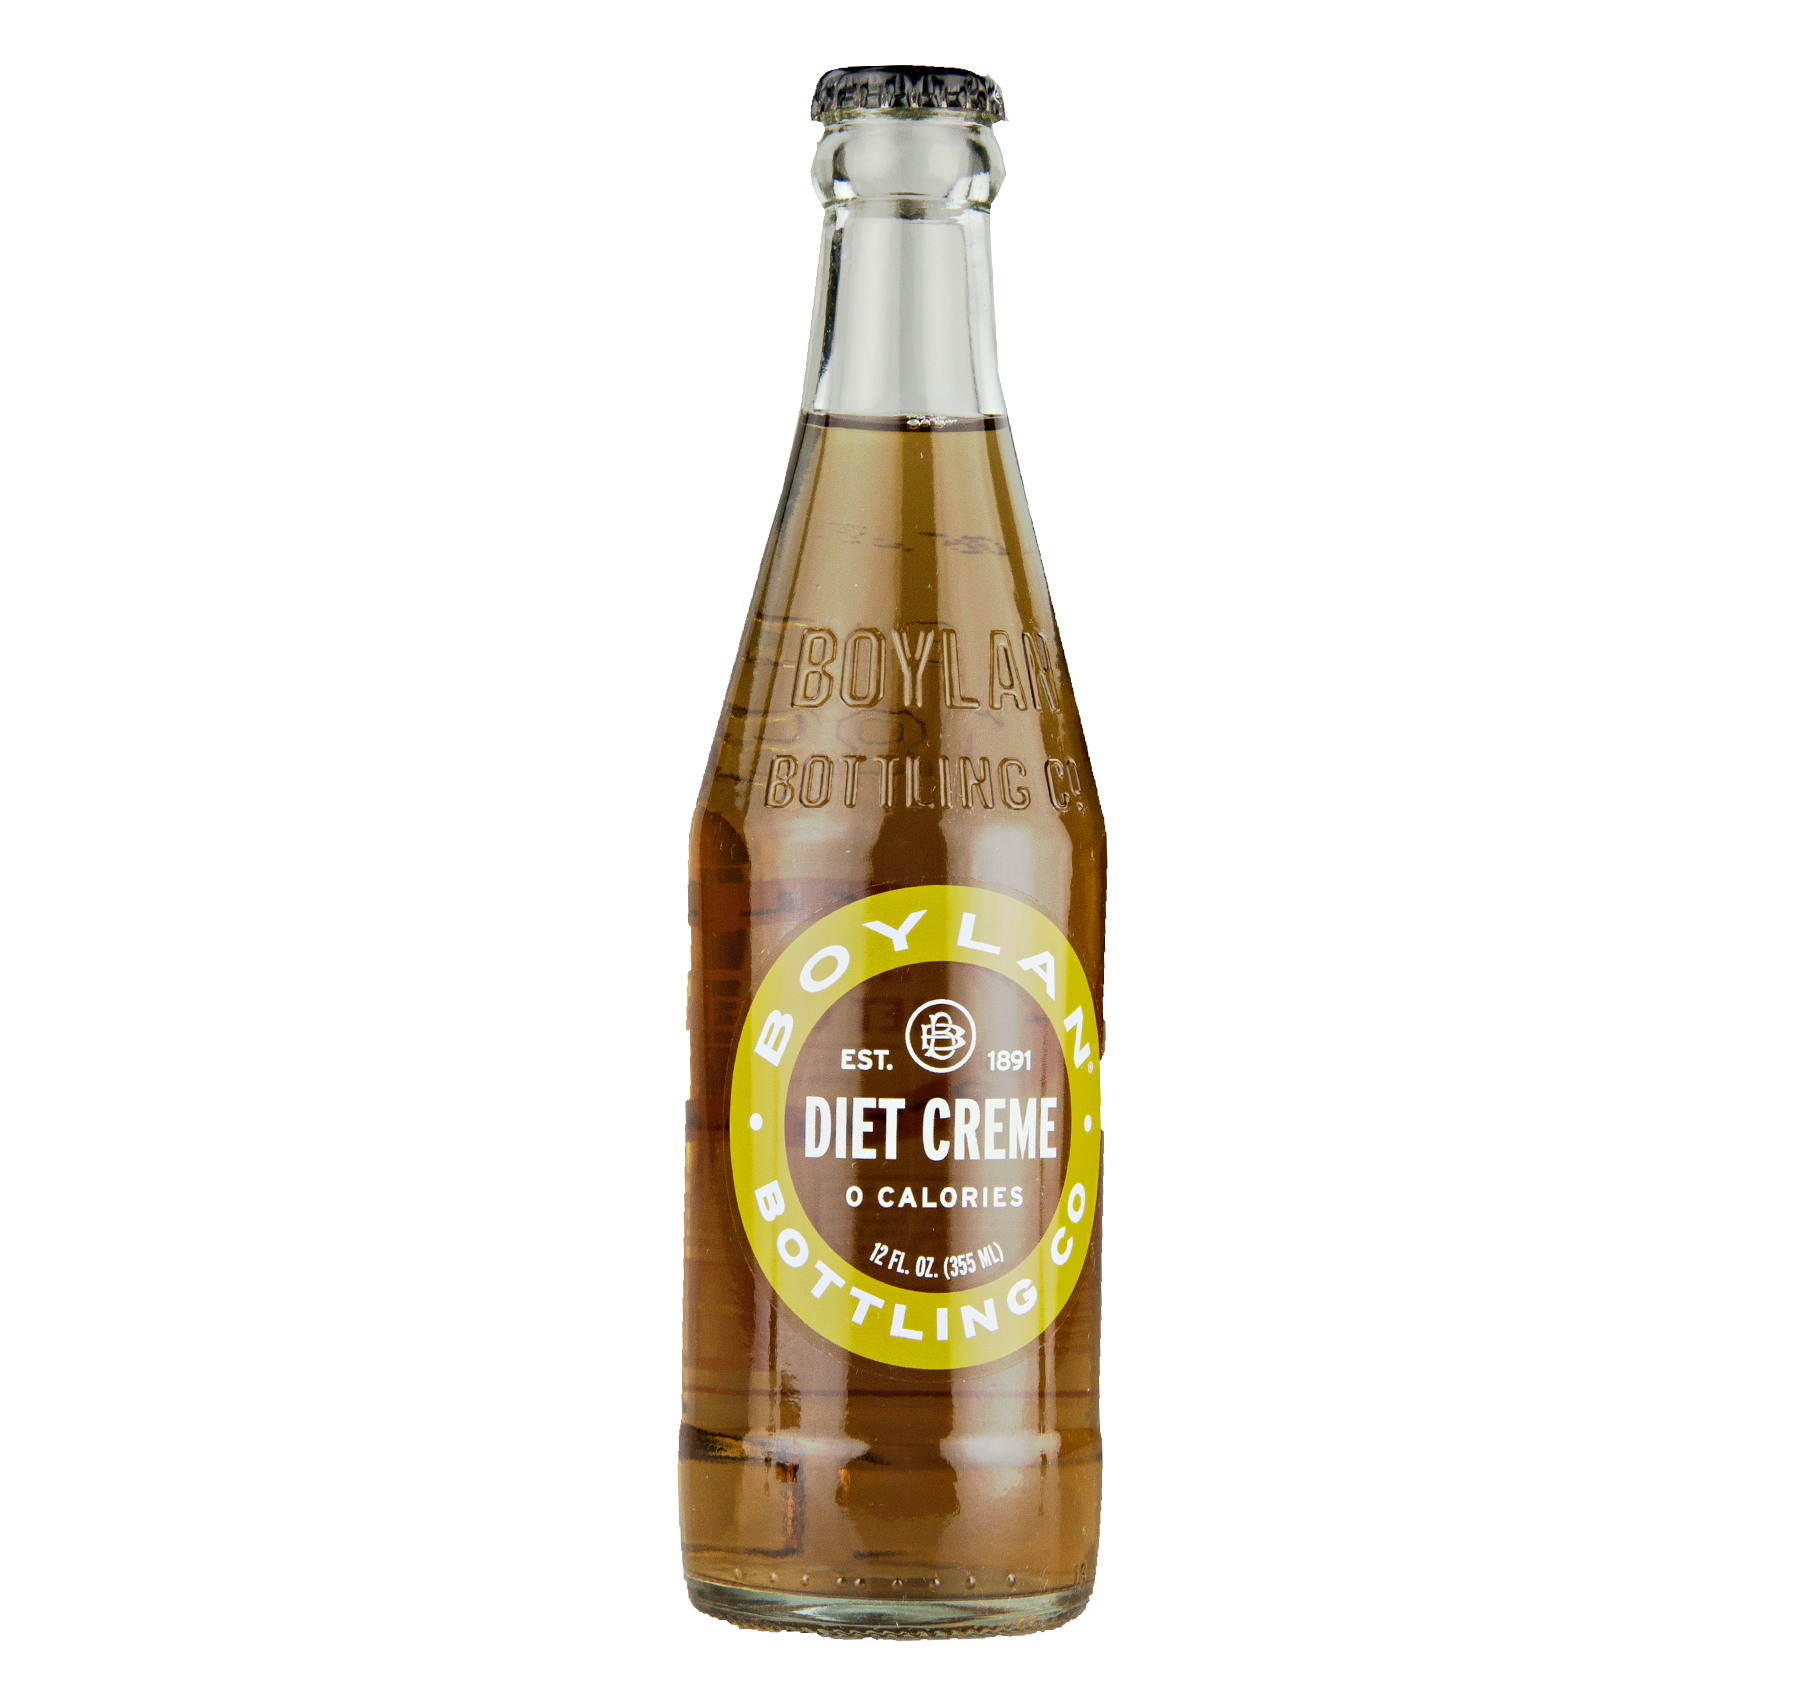 Boylan Bottling Boylan Diet Cream Soda 12 oz. (24 Bottles)